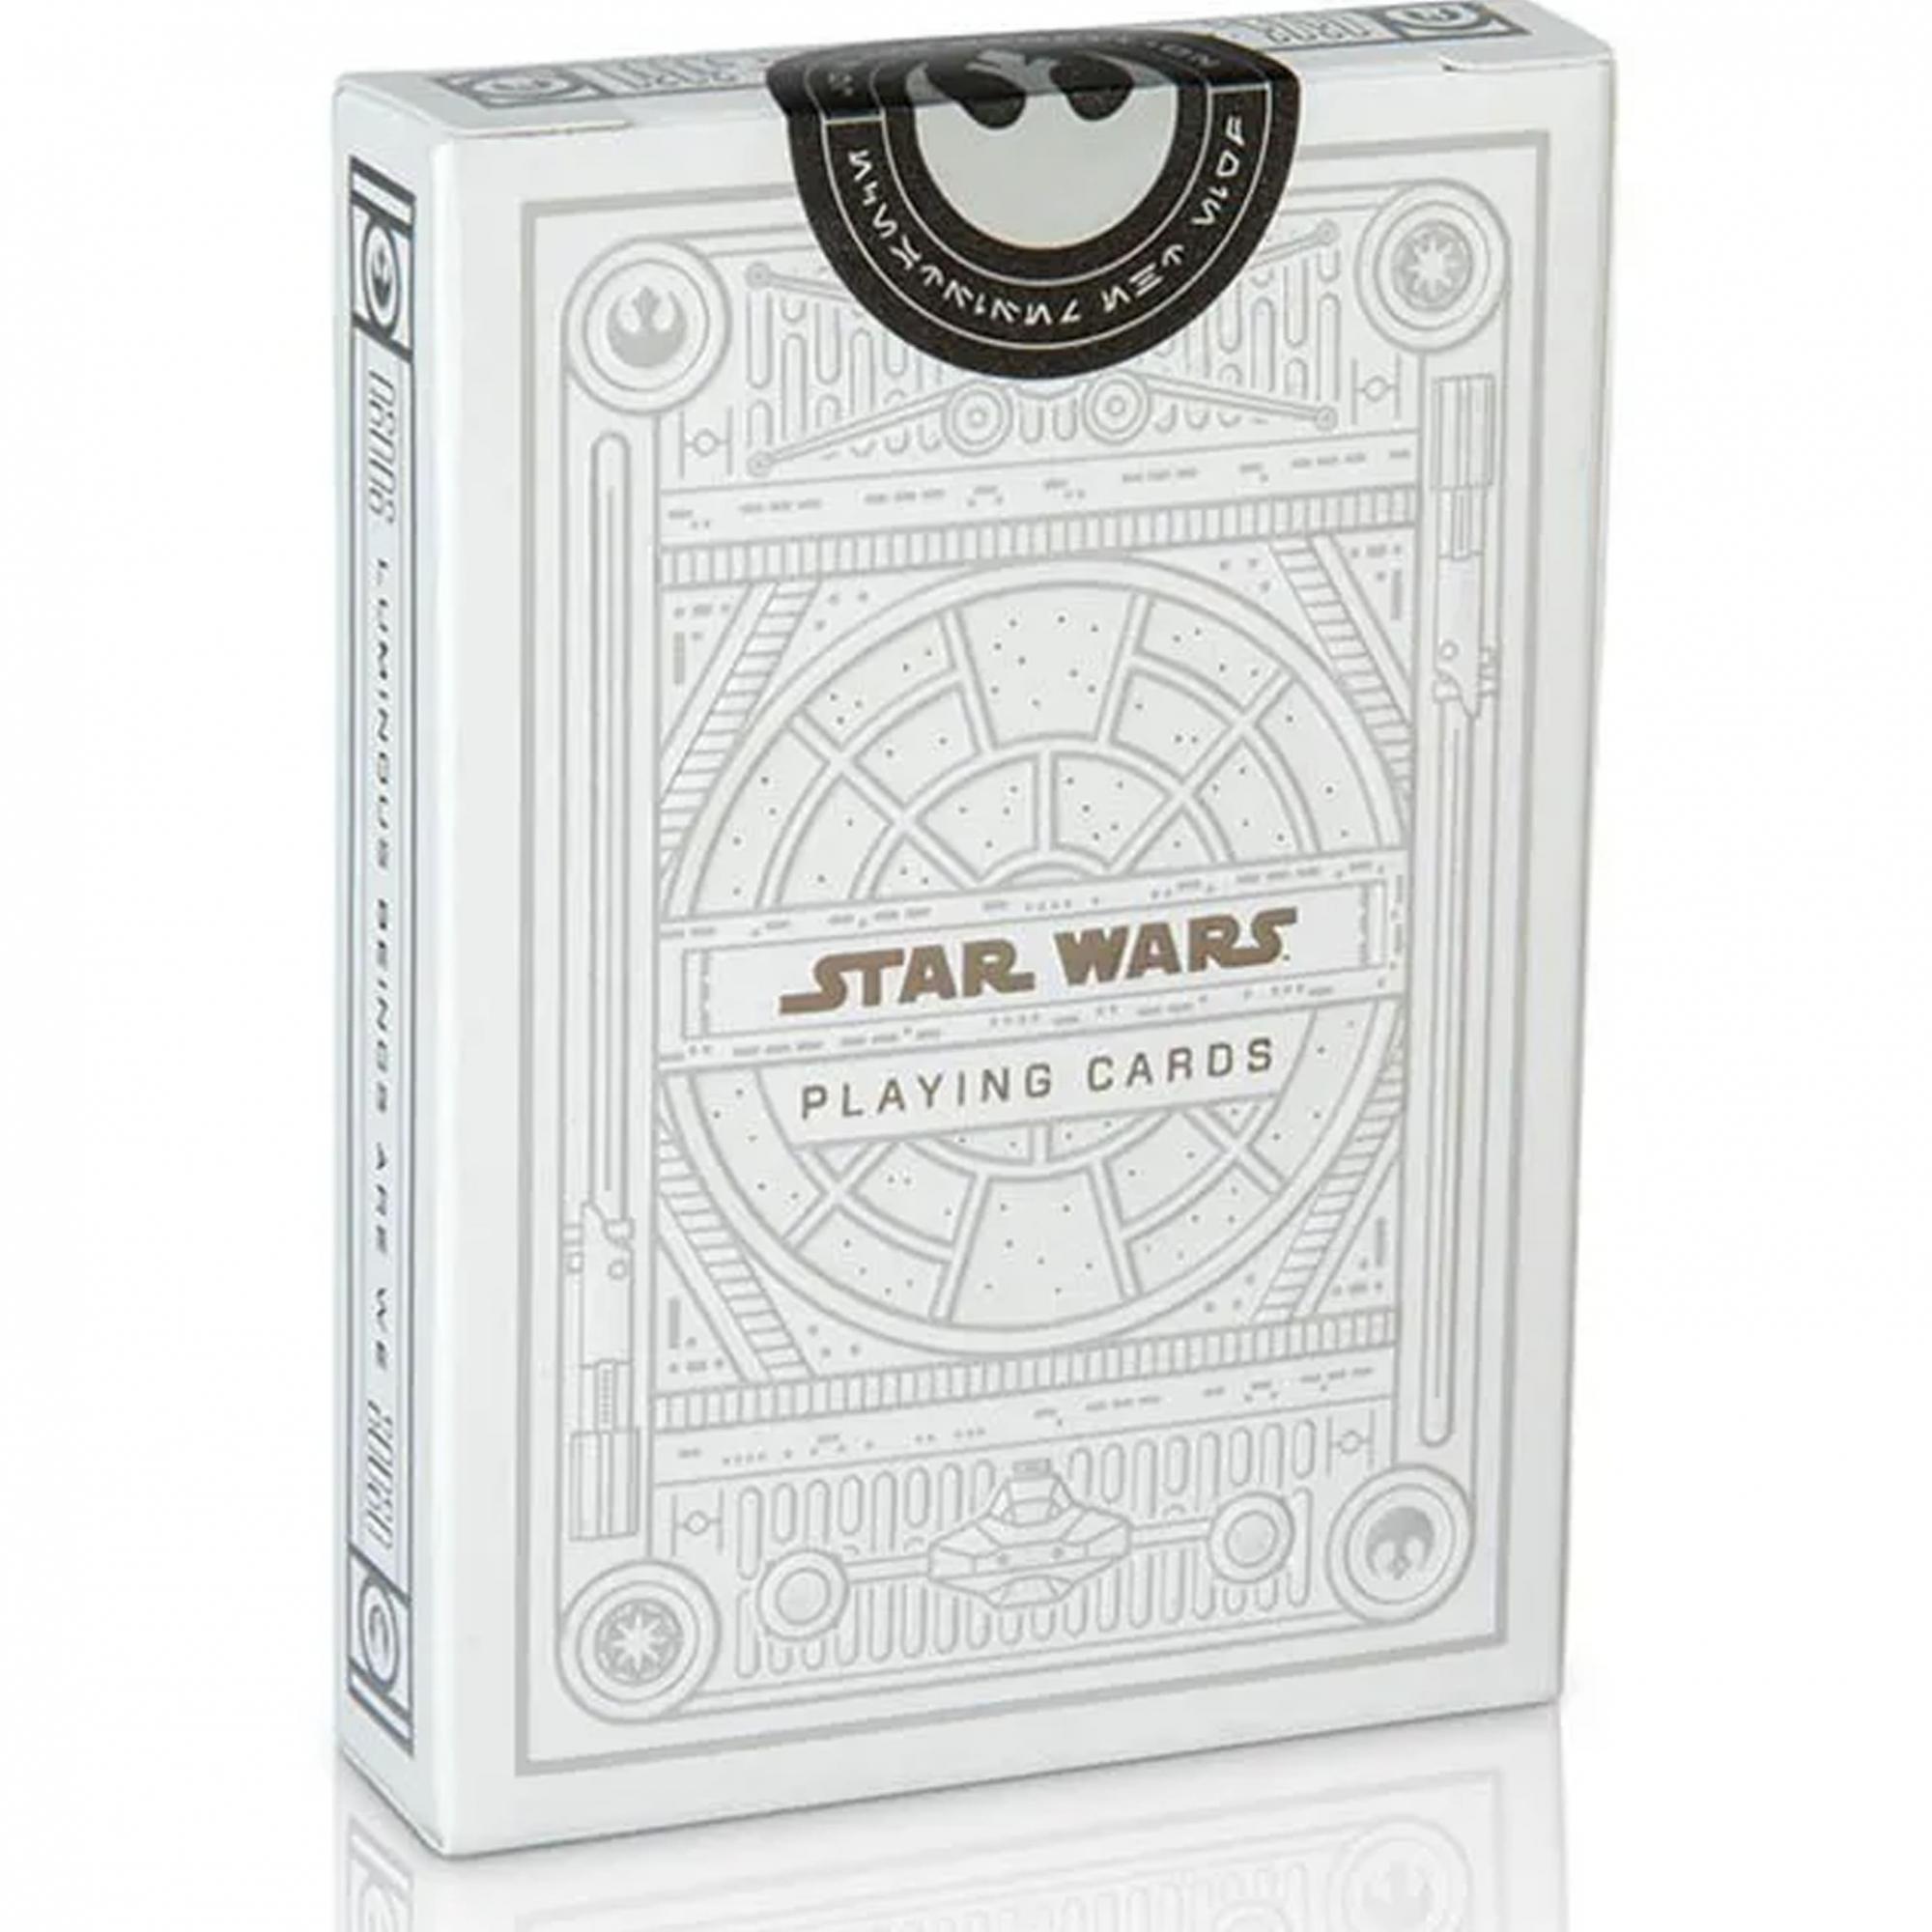 Baralho Star Wars Silver Edition Branco - Edição Especial.